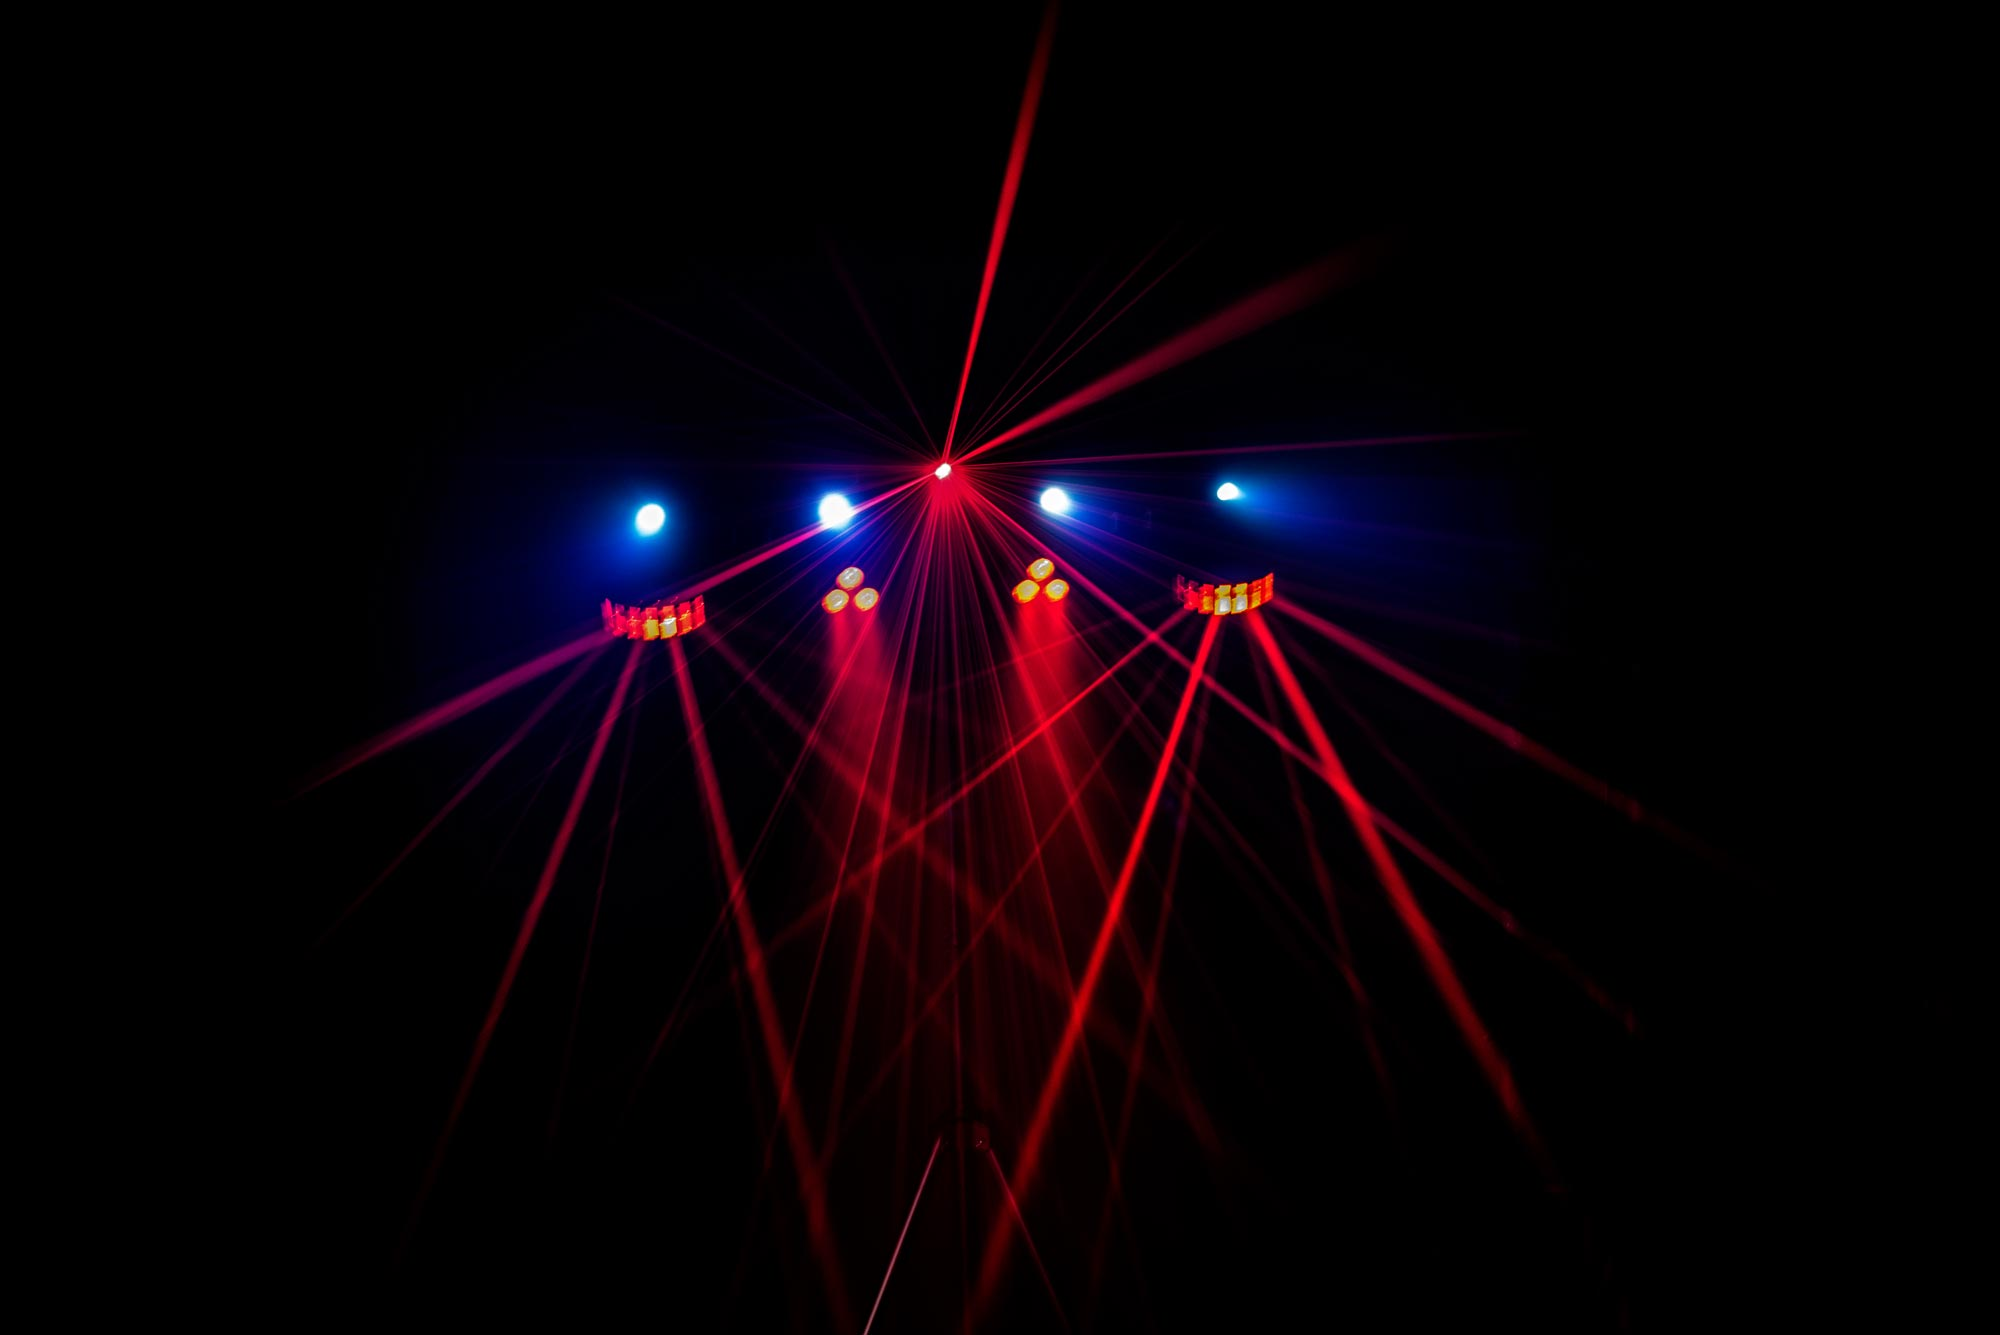 Chauvet Dj Gigbar2 Ultimate Pack N Go 4 In 1 Lighting